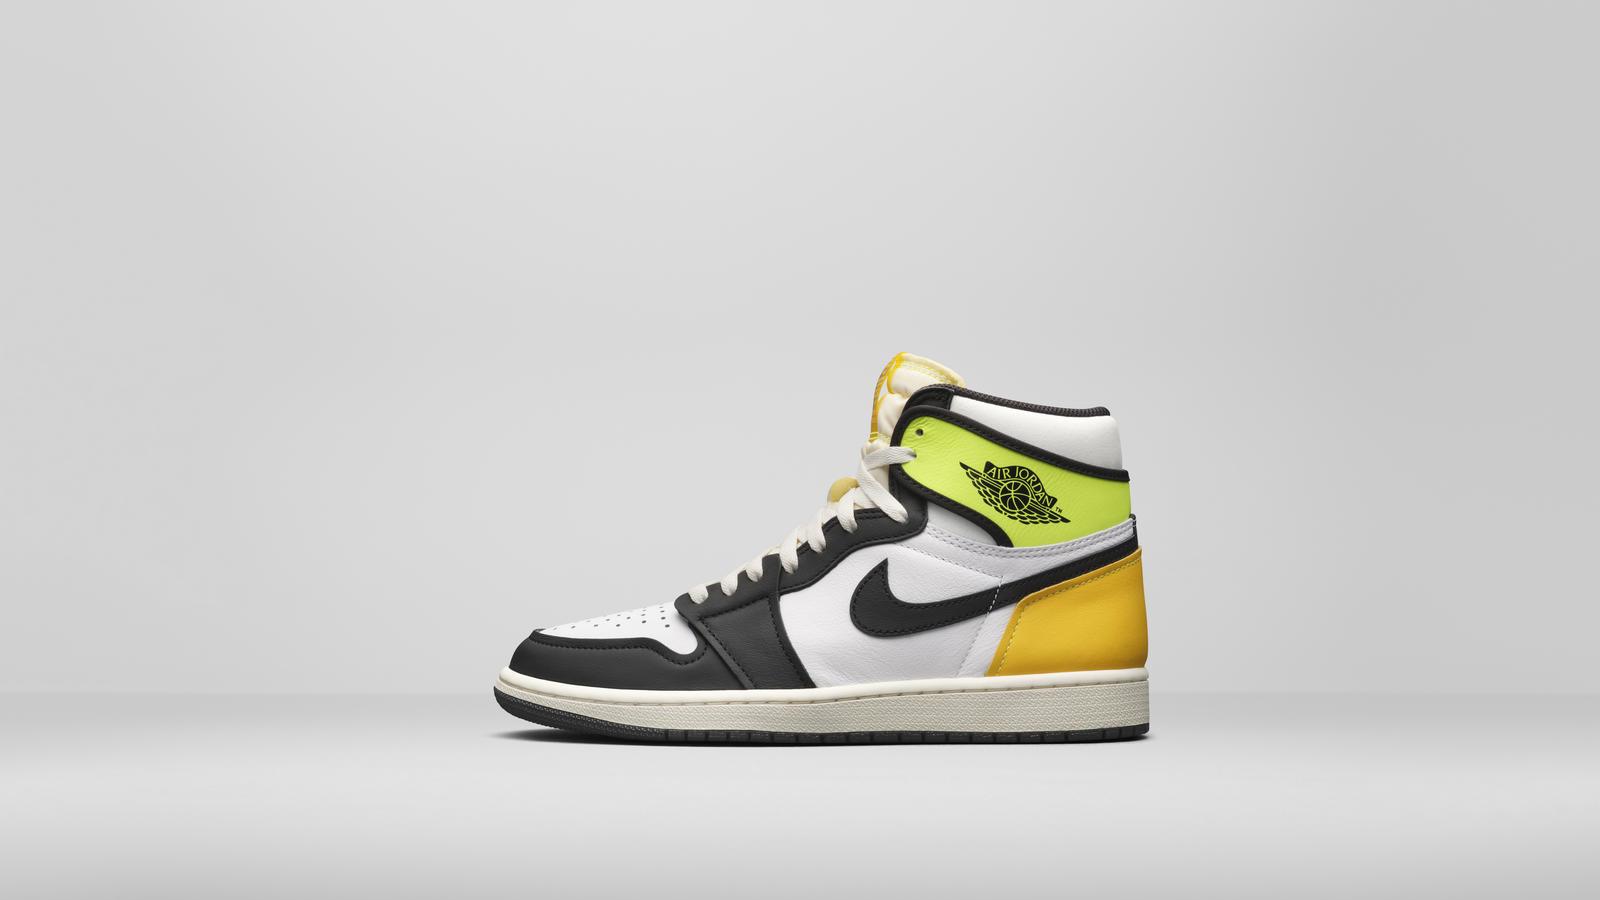 Jordan Brand Spring 2021 Retro Releases 7